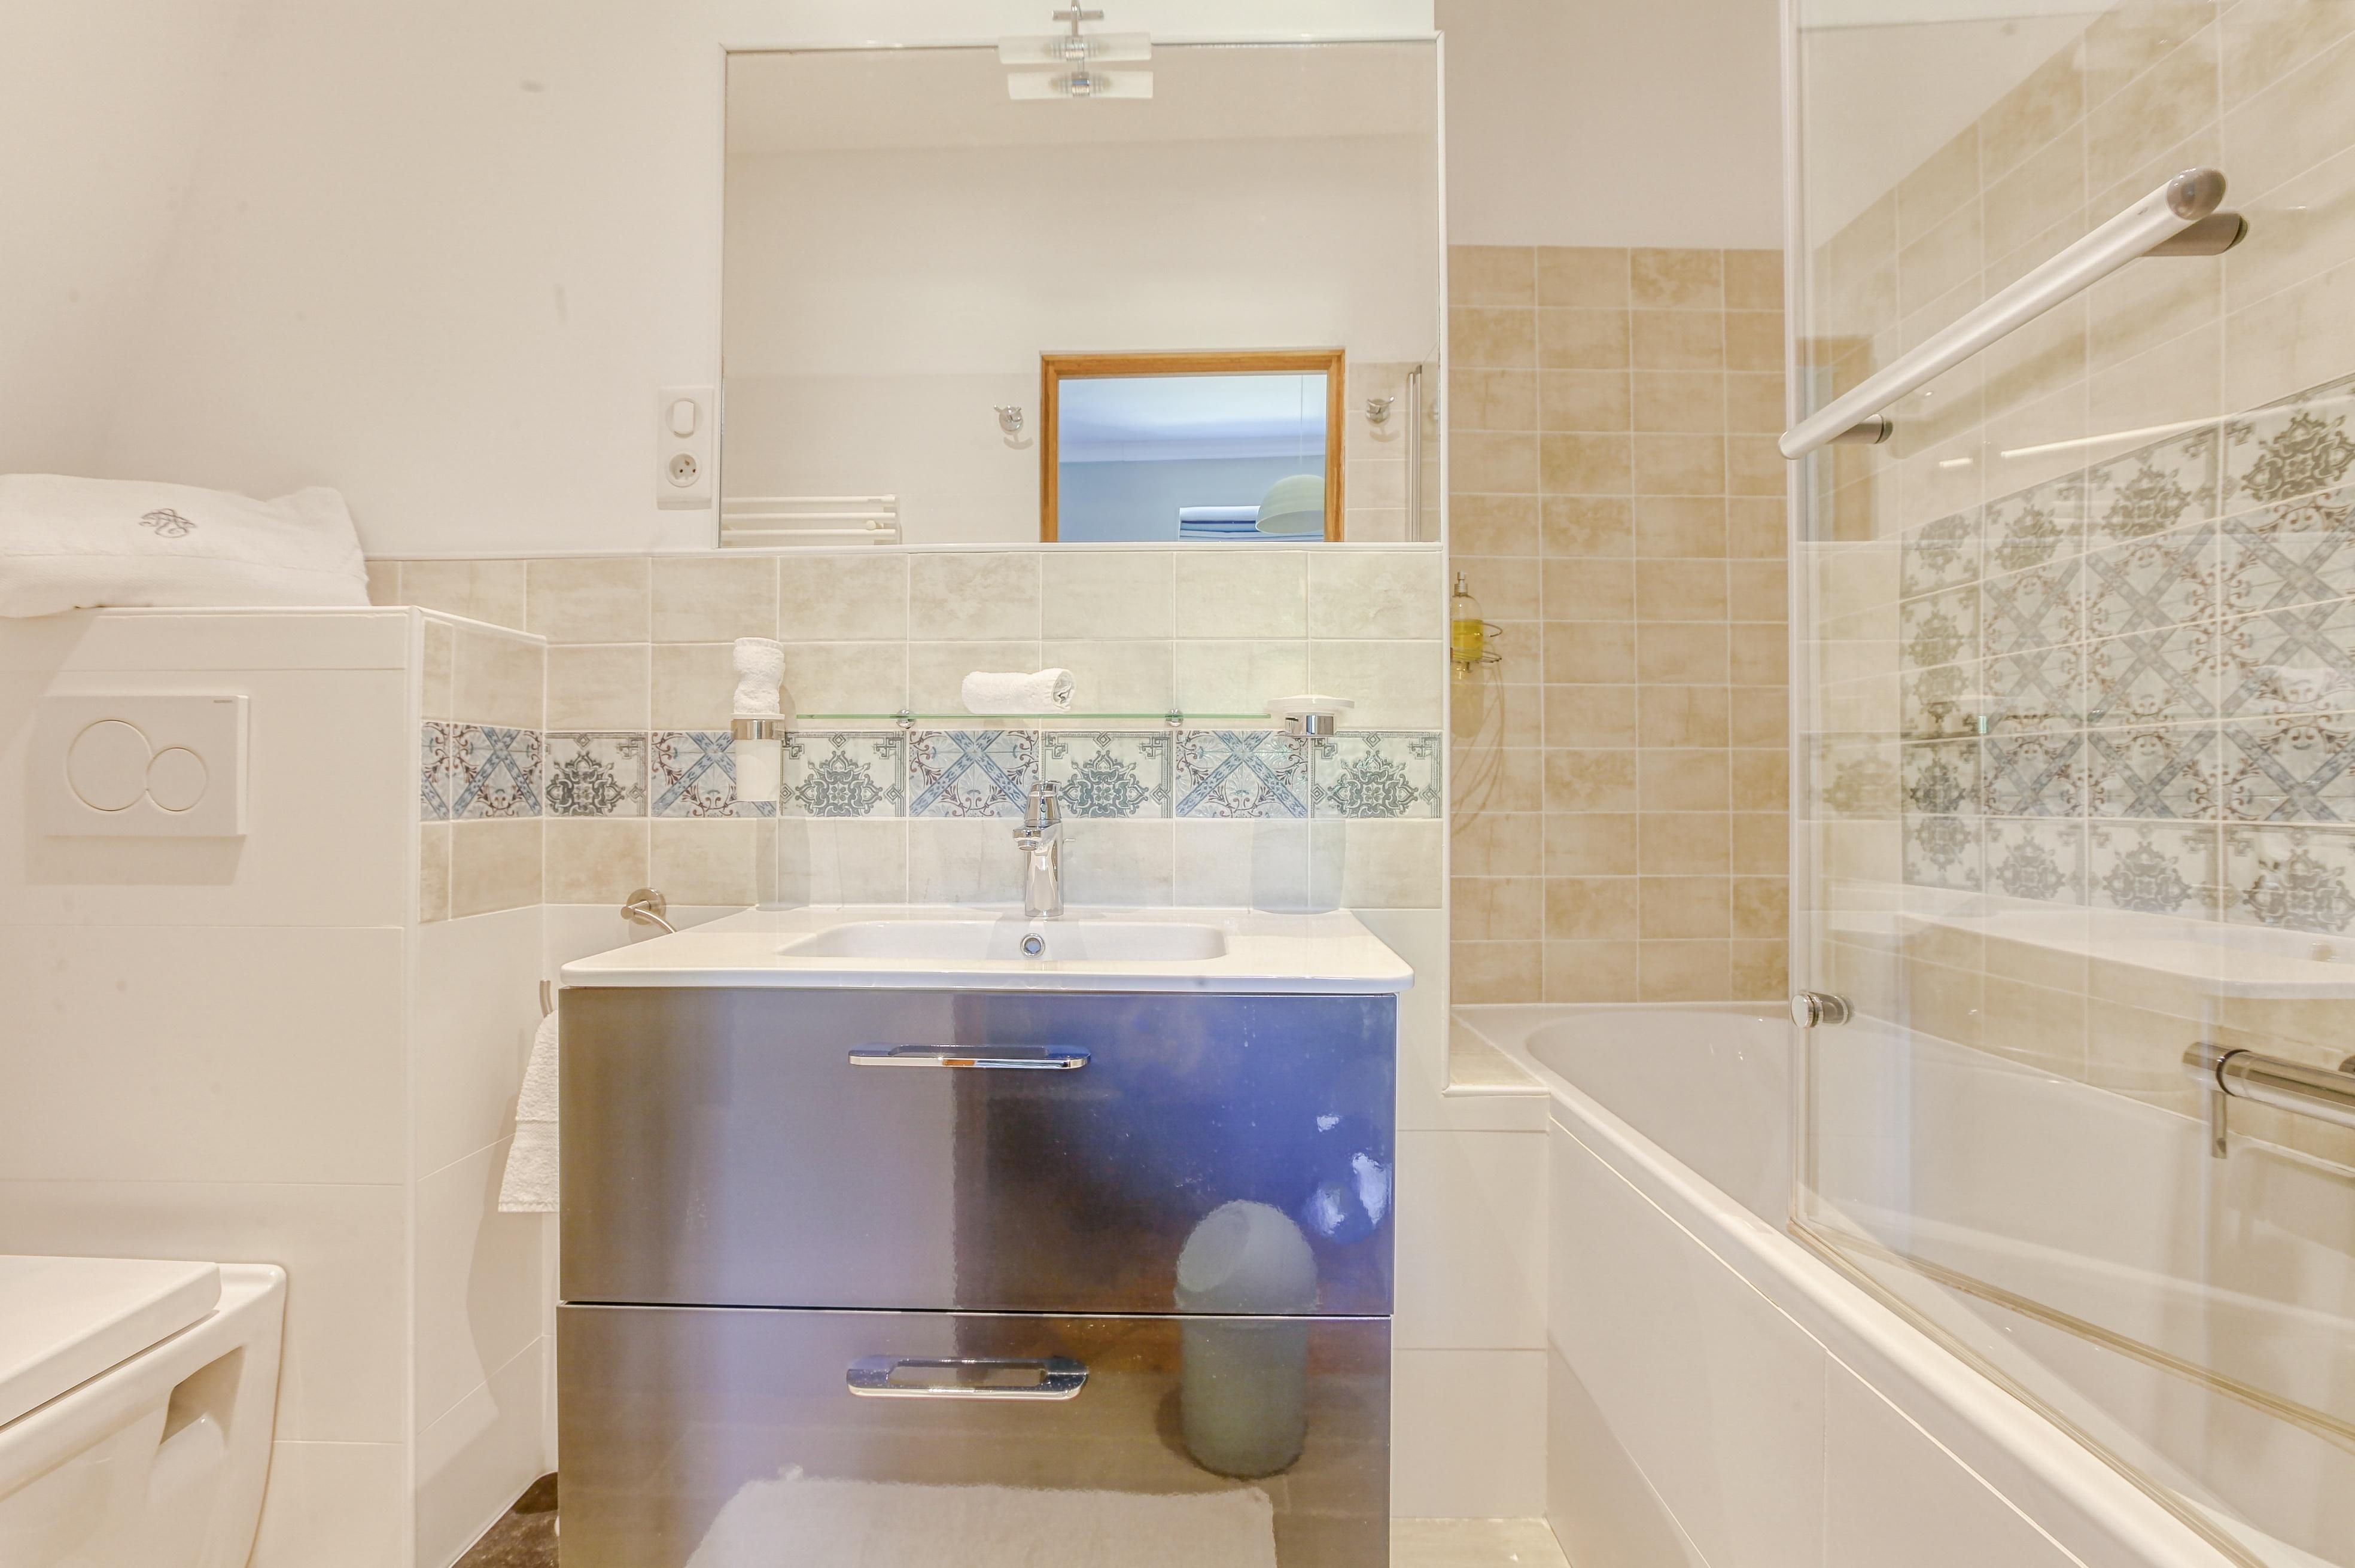 Salle de bain Gerberoy